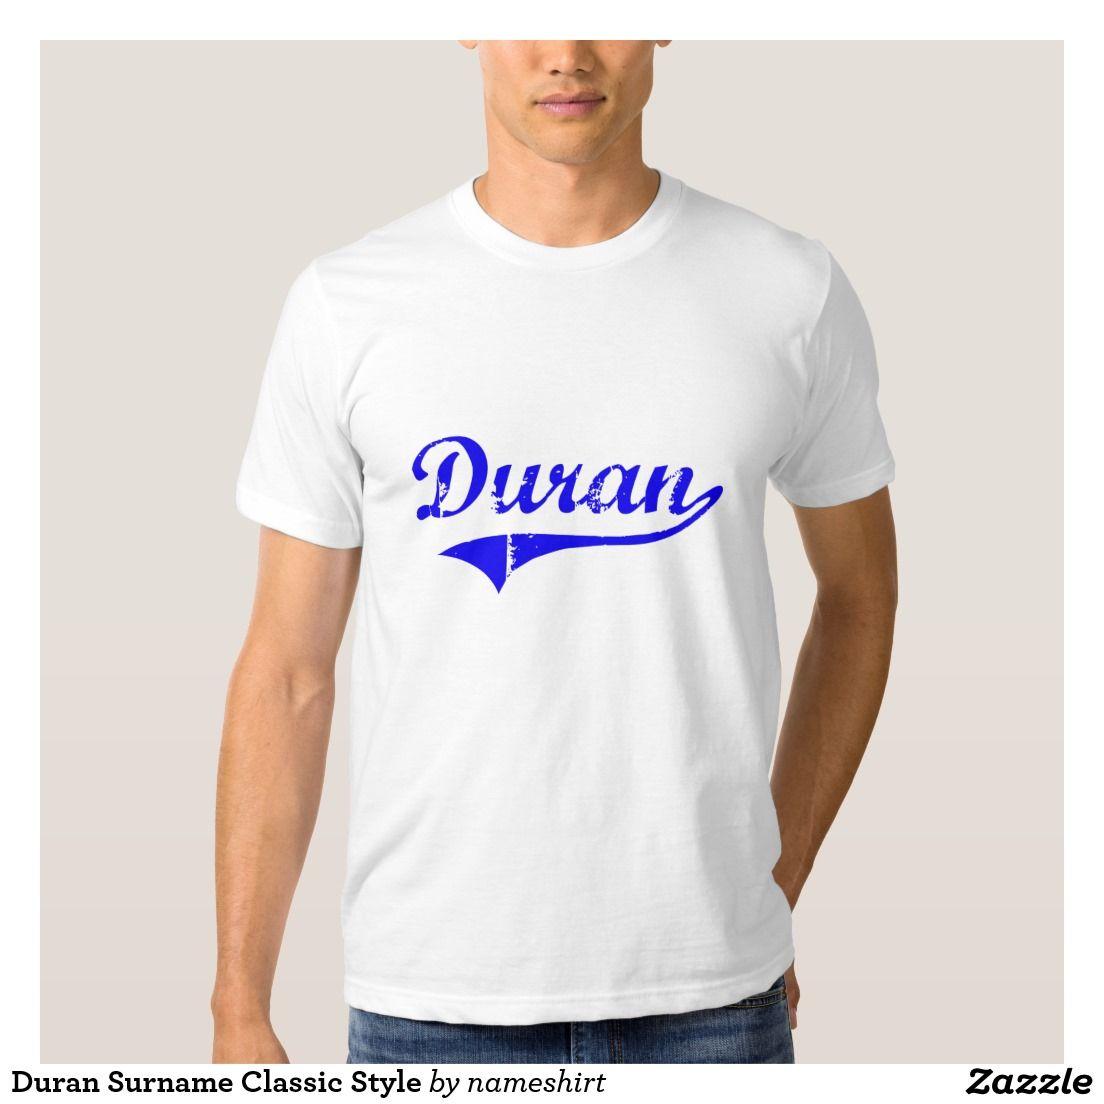 Duran Surname Classic Style Tee Shirt